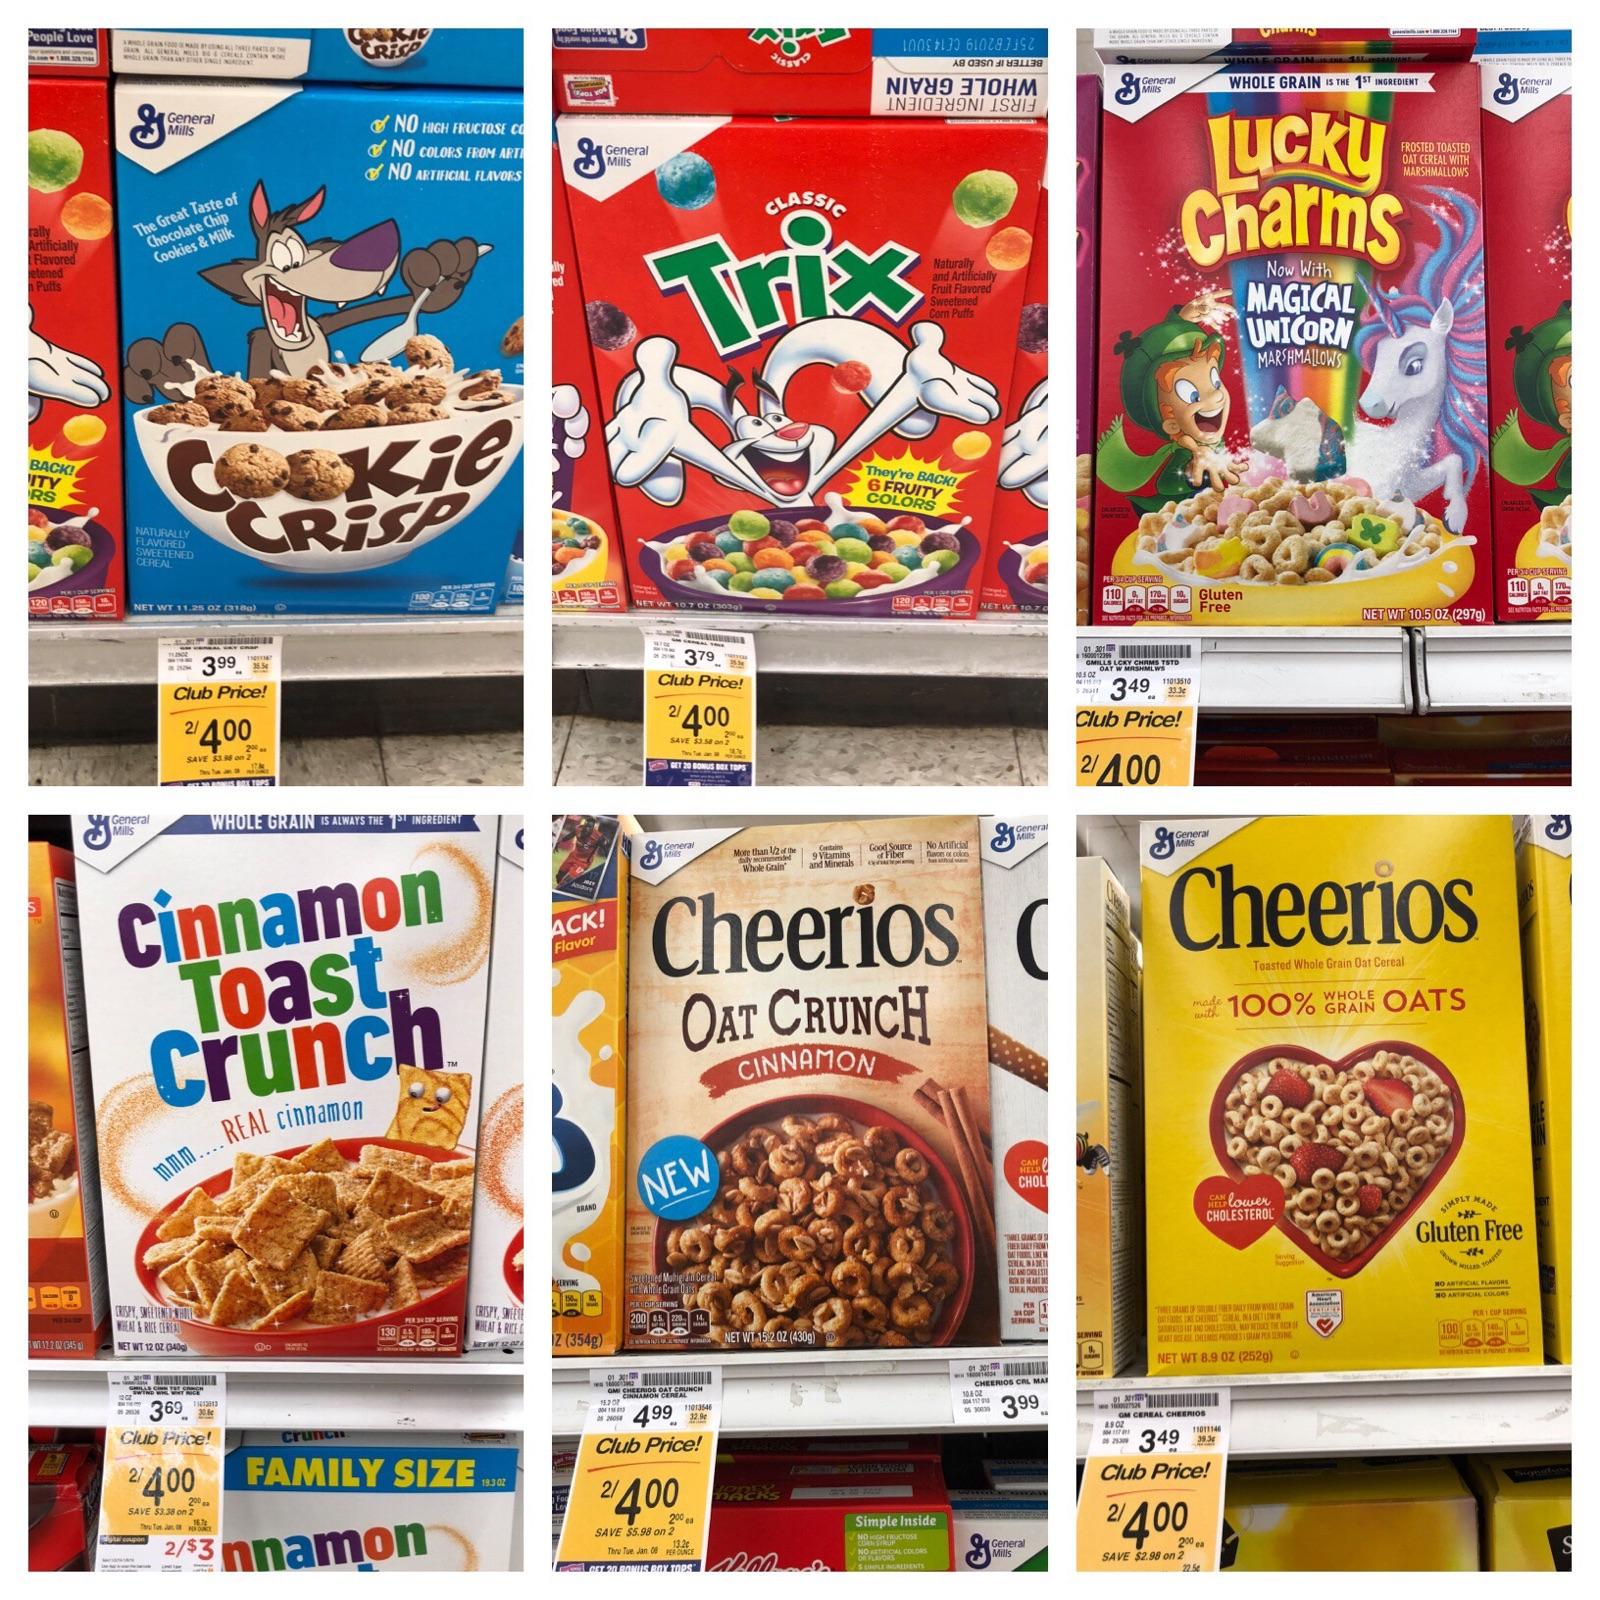 General Mills Cereal Sale